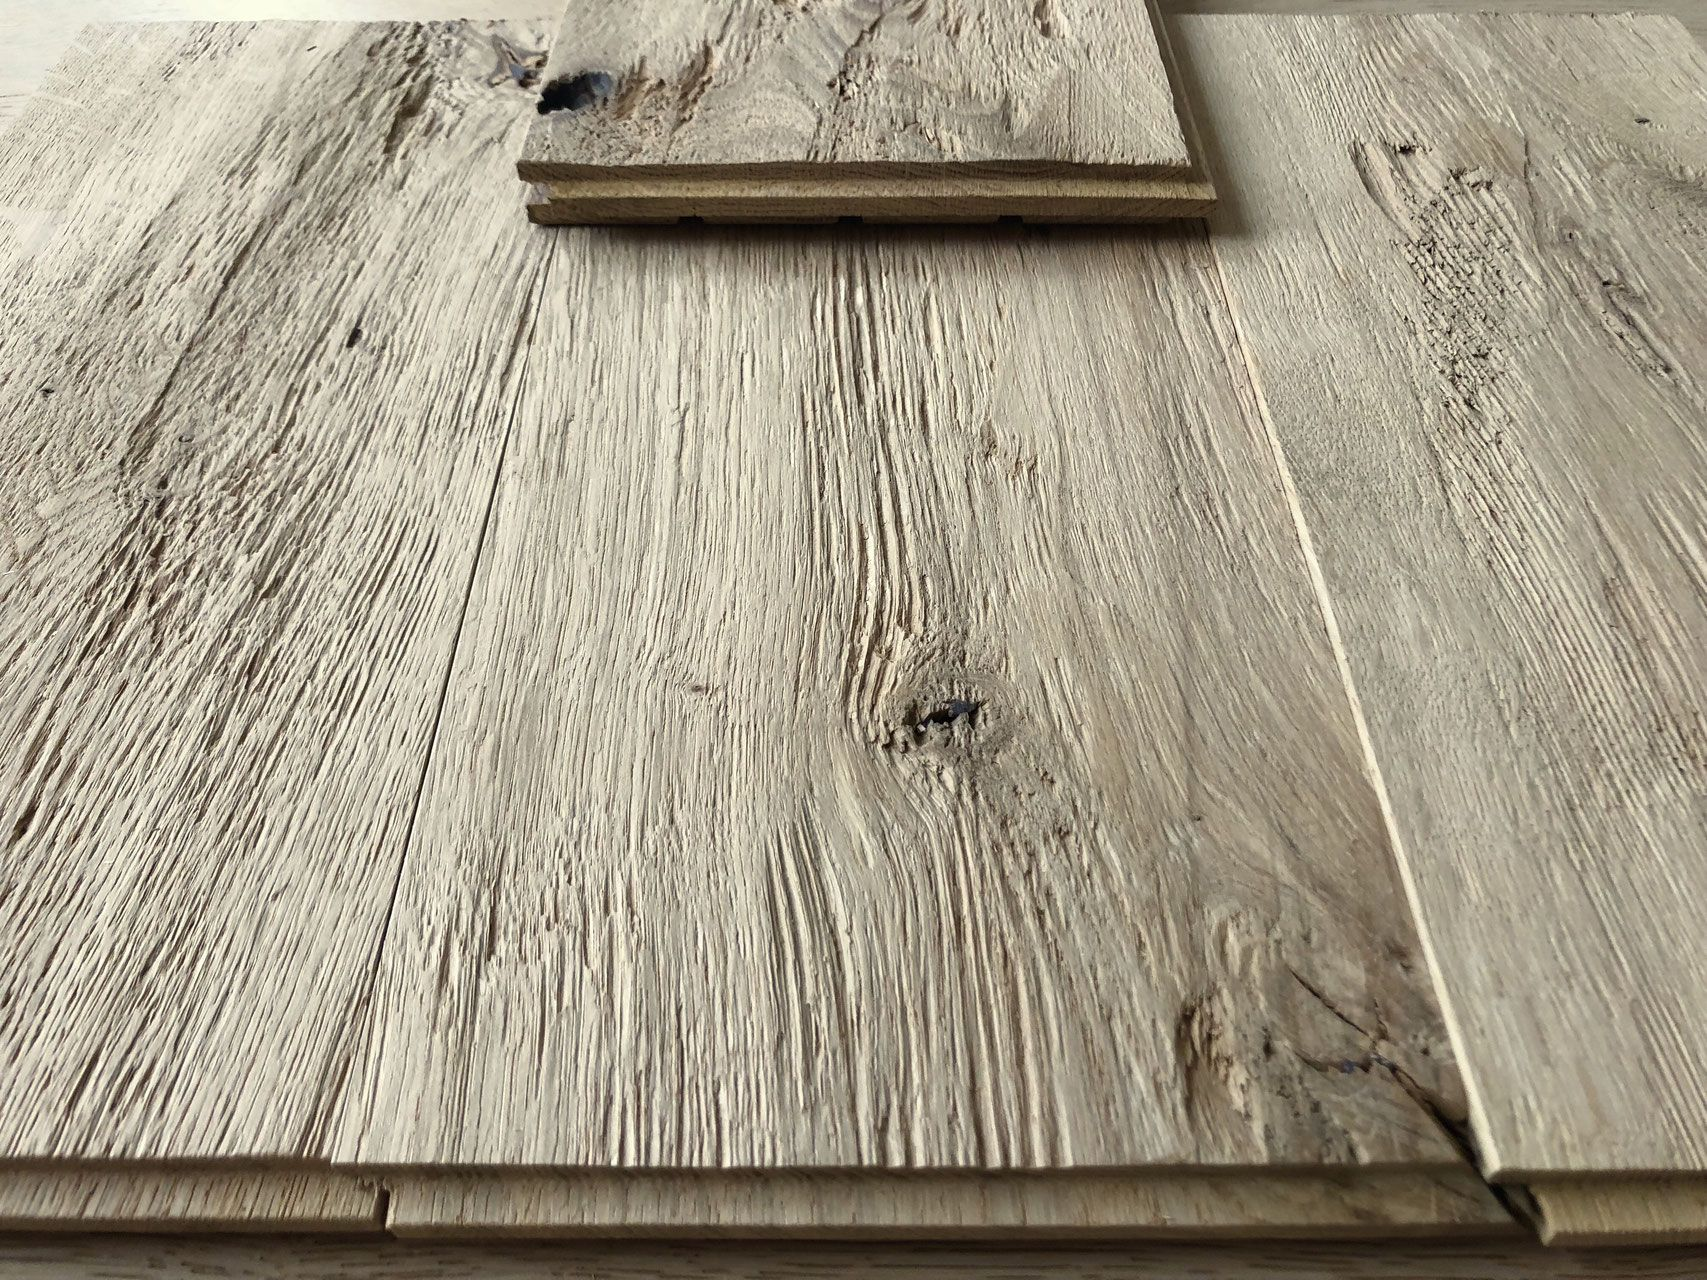 Rustikale Wandverkleidung Eiche Gehackt Geburstet Vintage Holz Wandverkleidung Altholz Wandverkleidung Wandverkleidung Holz